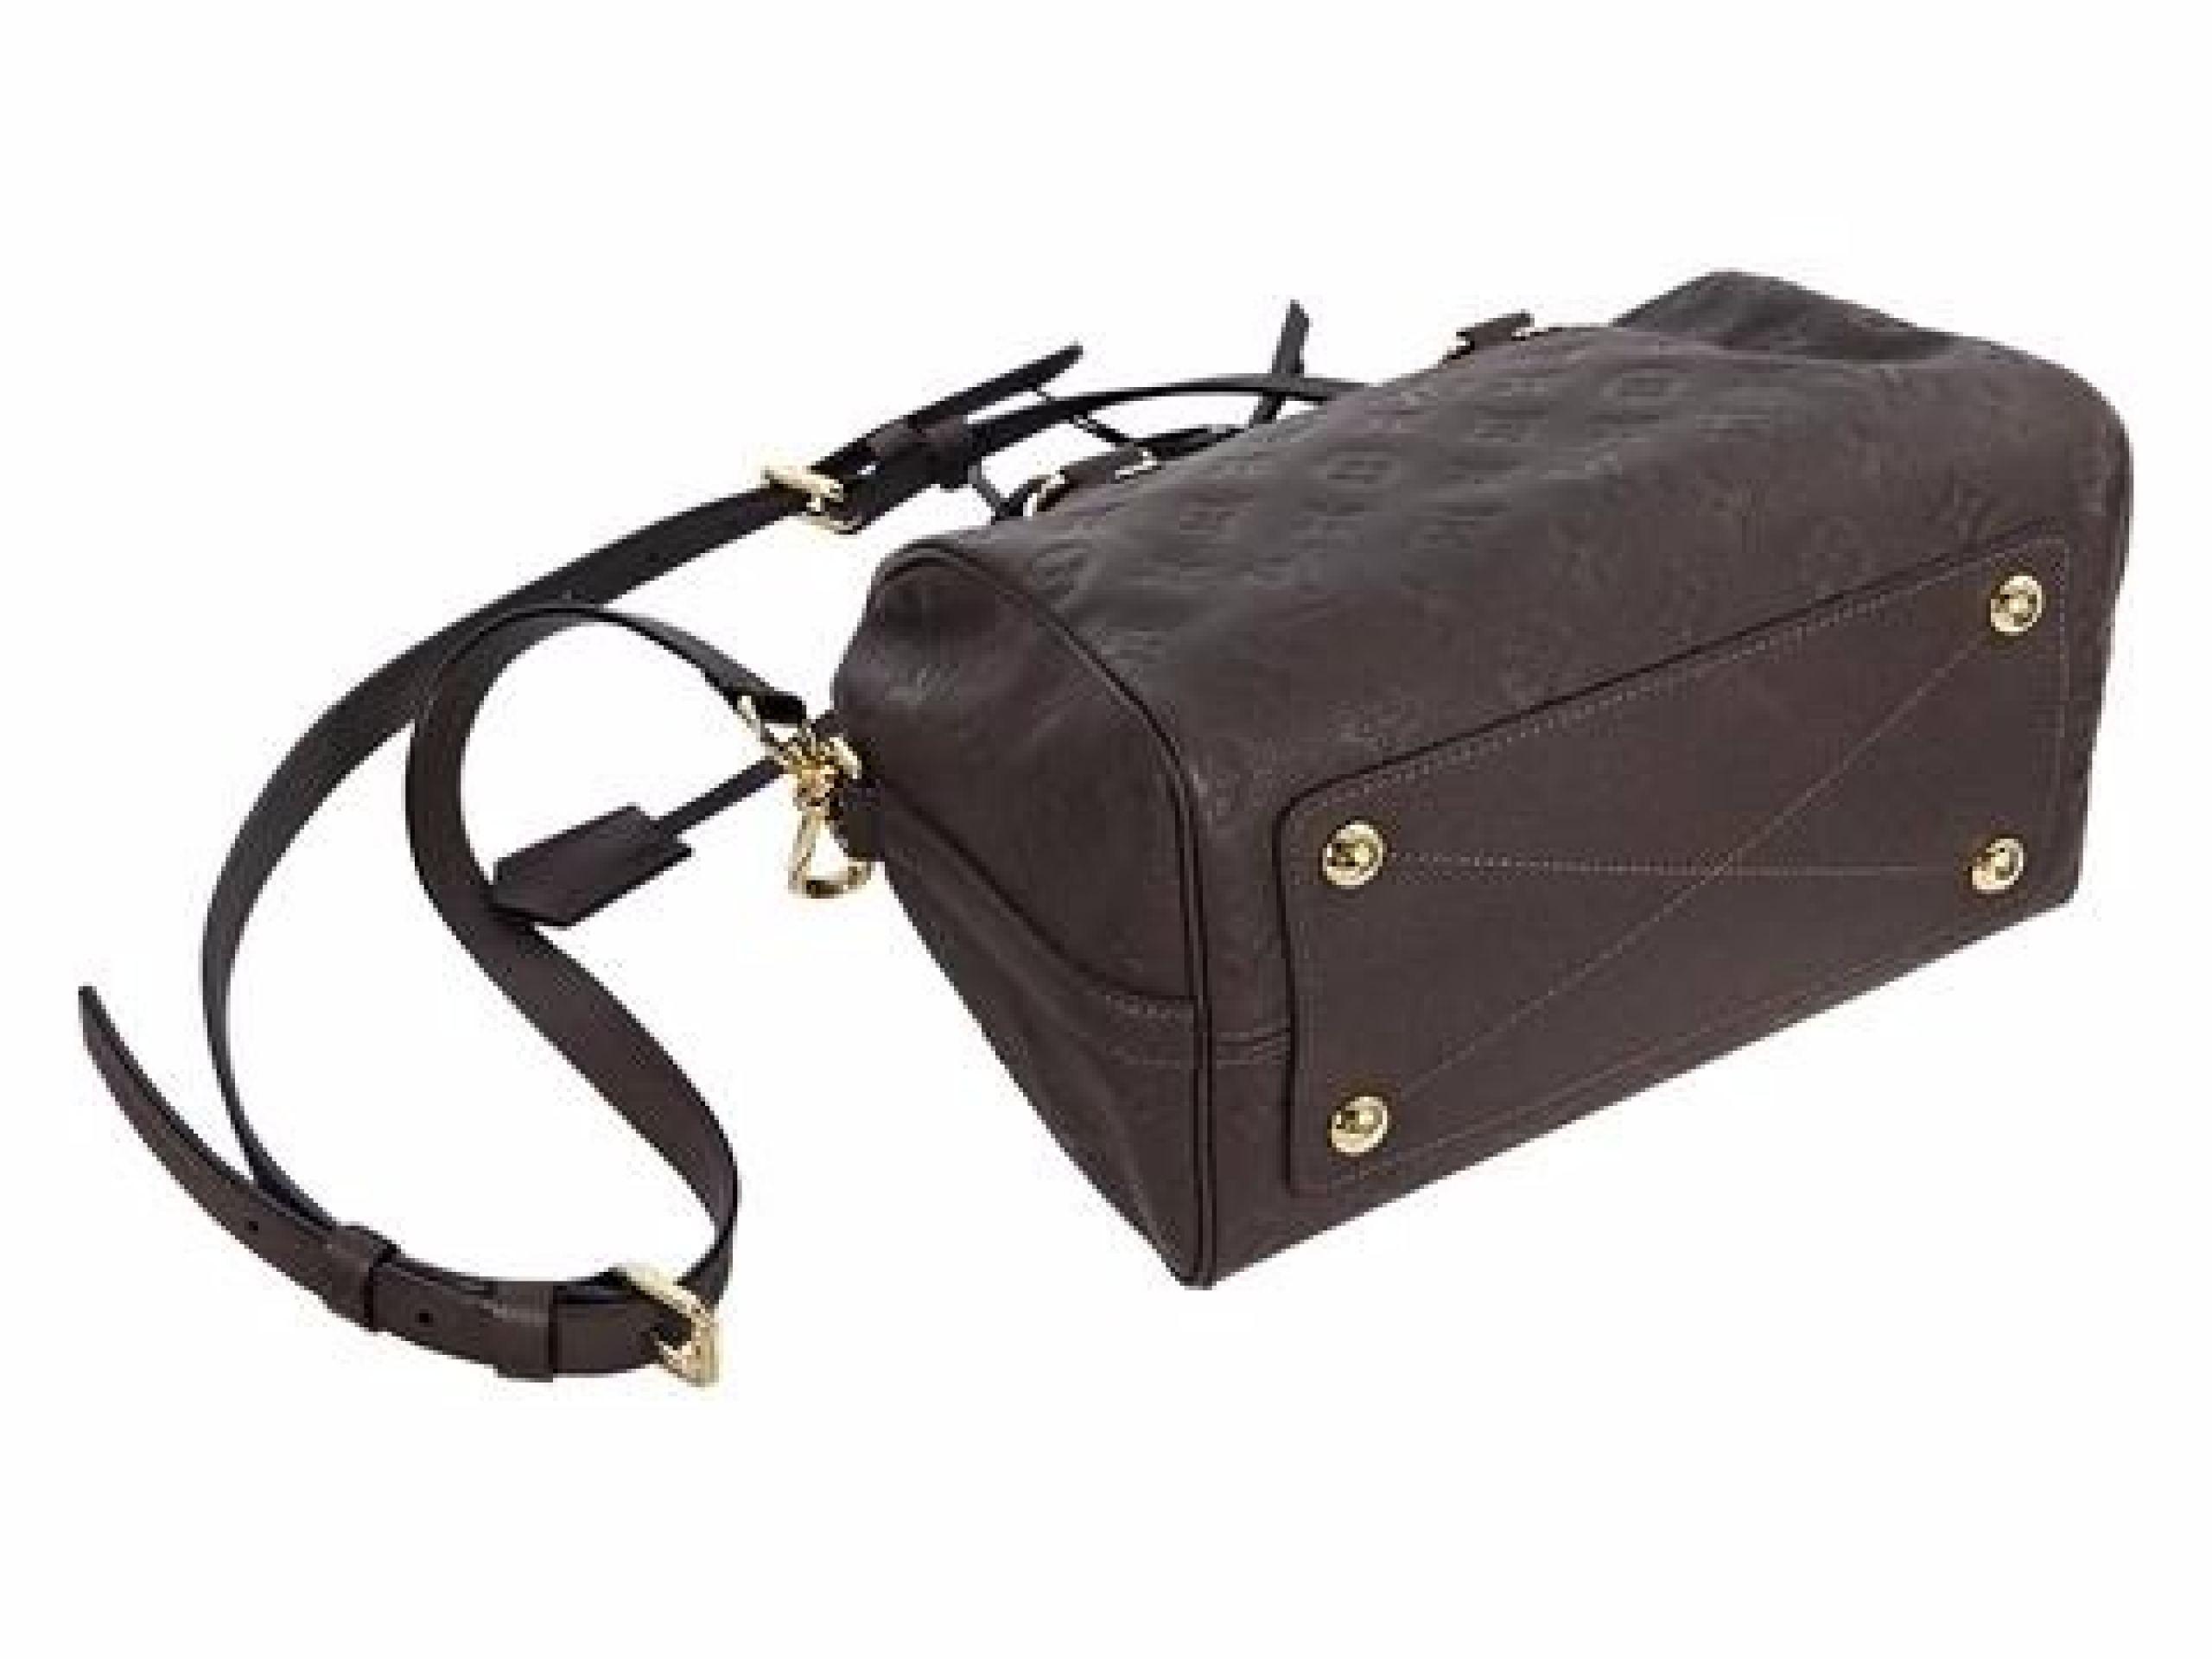 Brown Louis Vuitton Empreinte Speedy 25 Bag